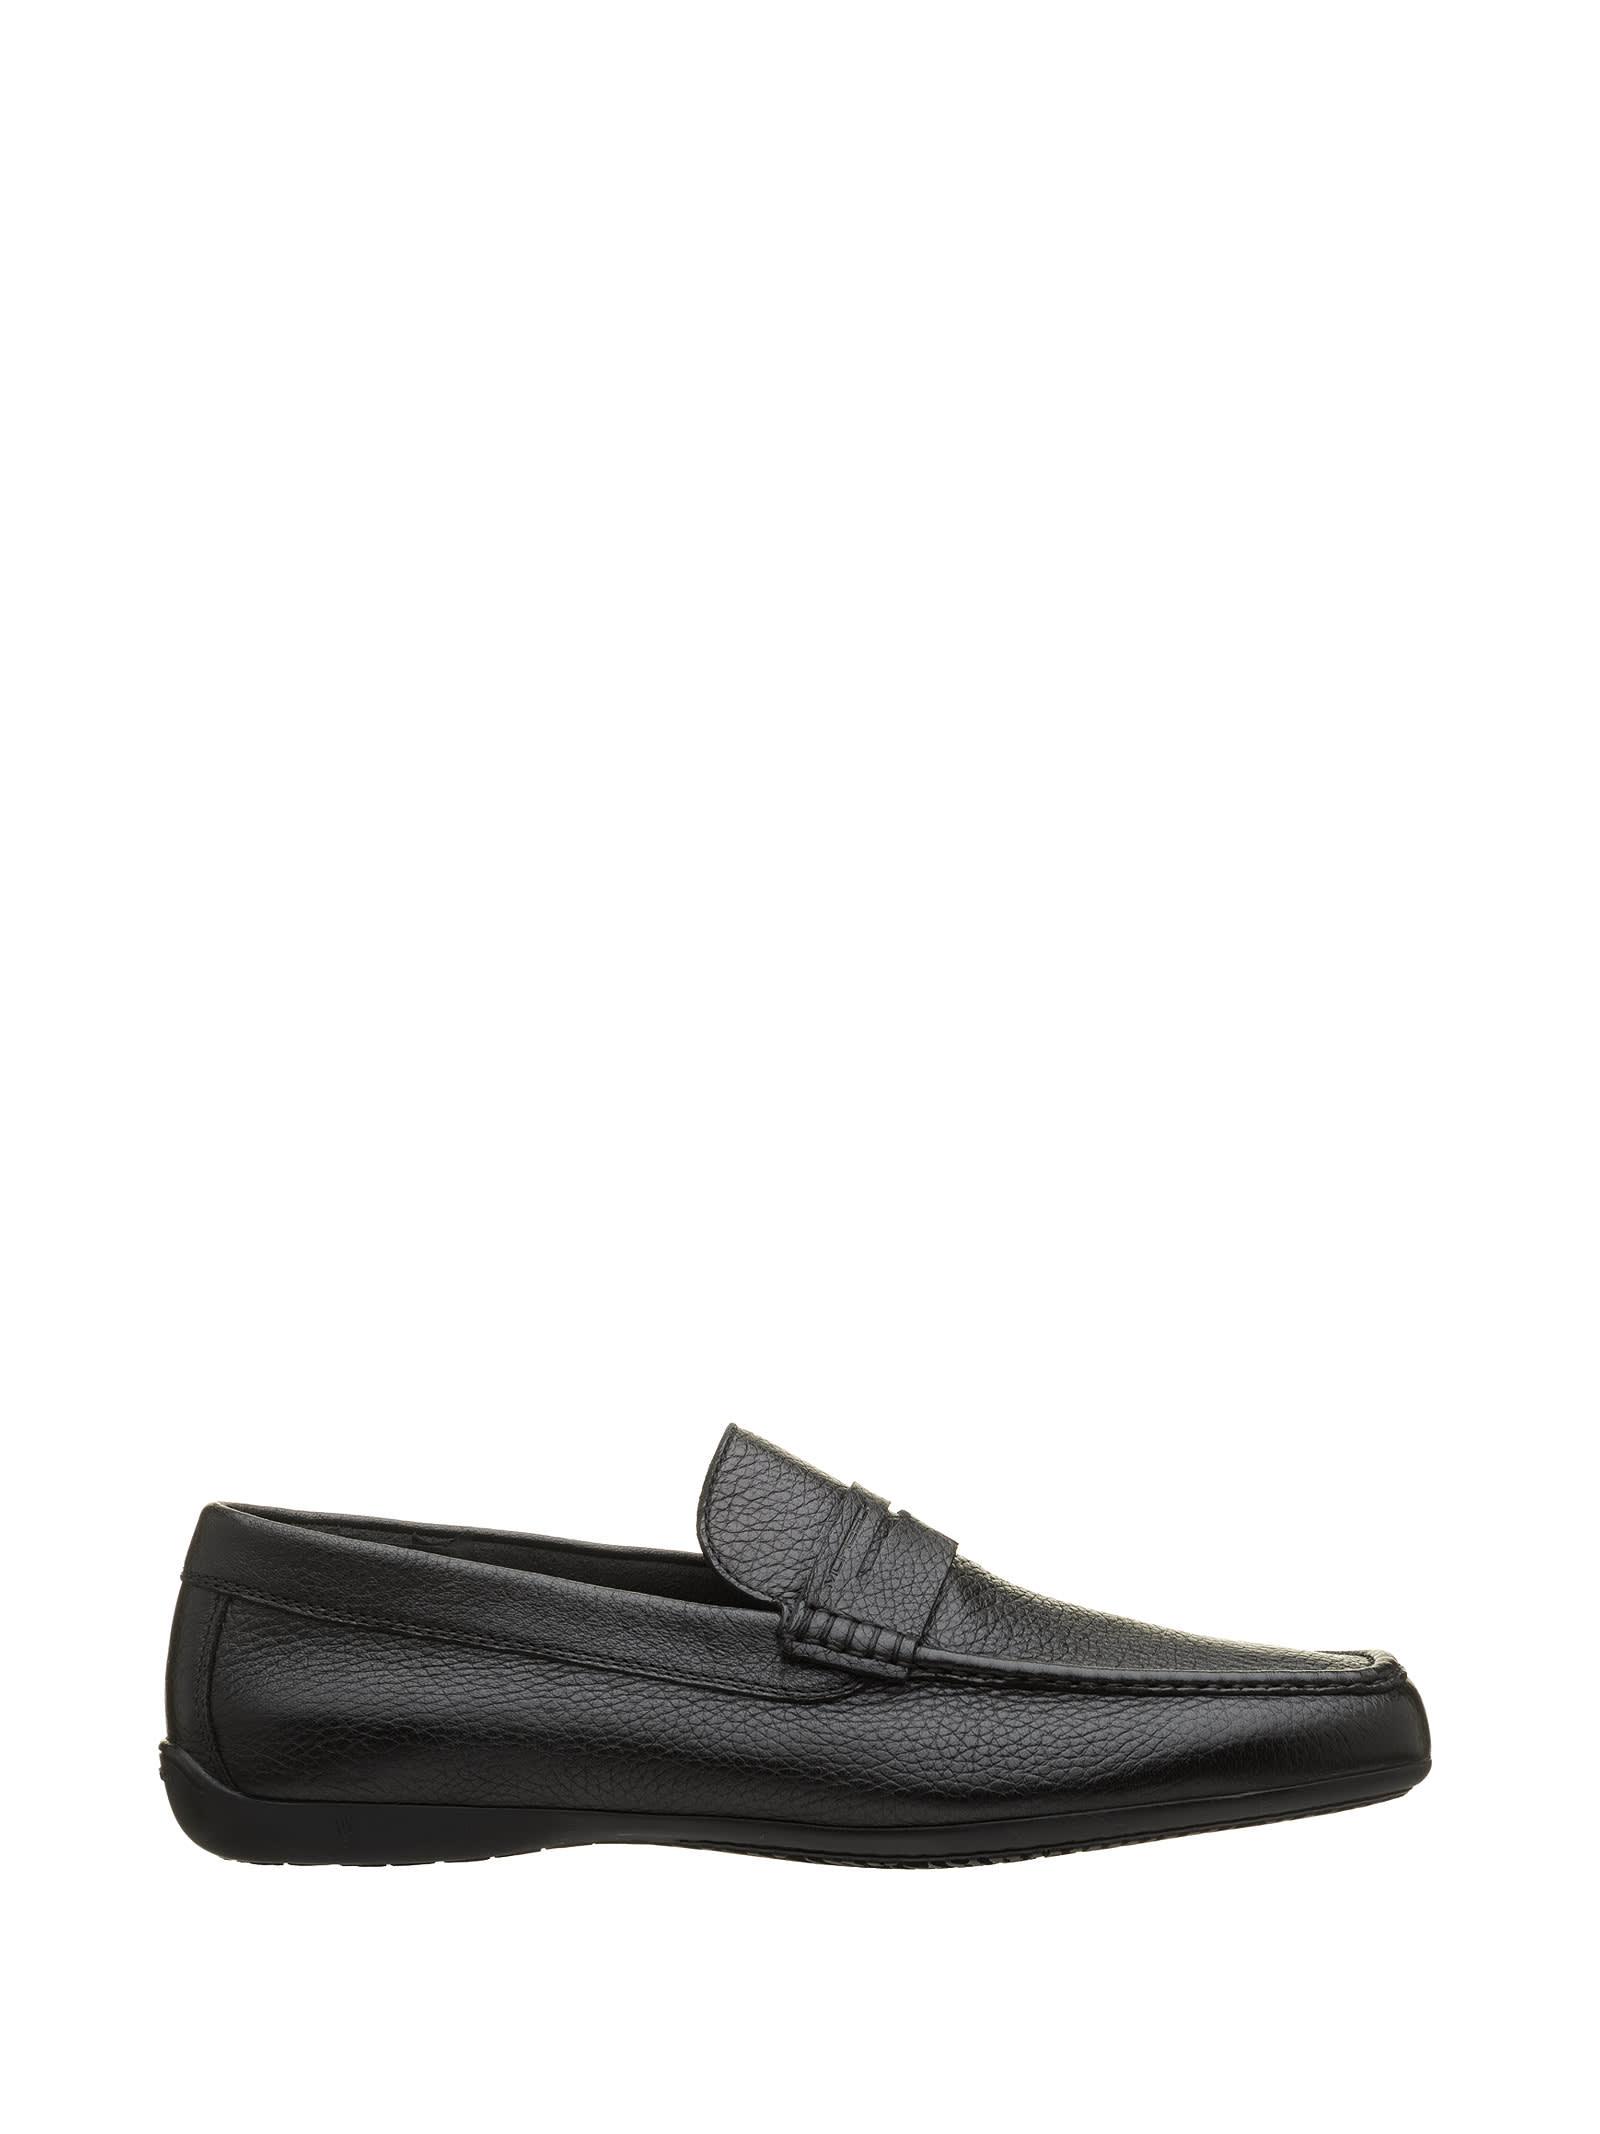 Moreschi Moreschi Black Leather Loafer